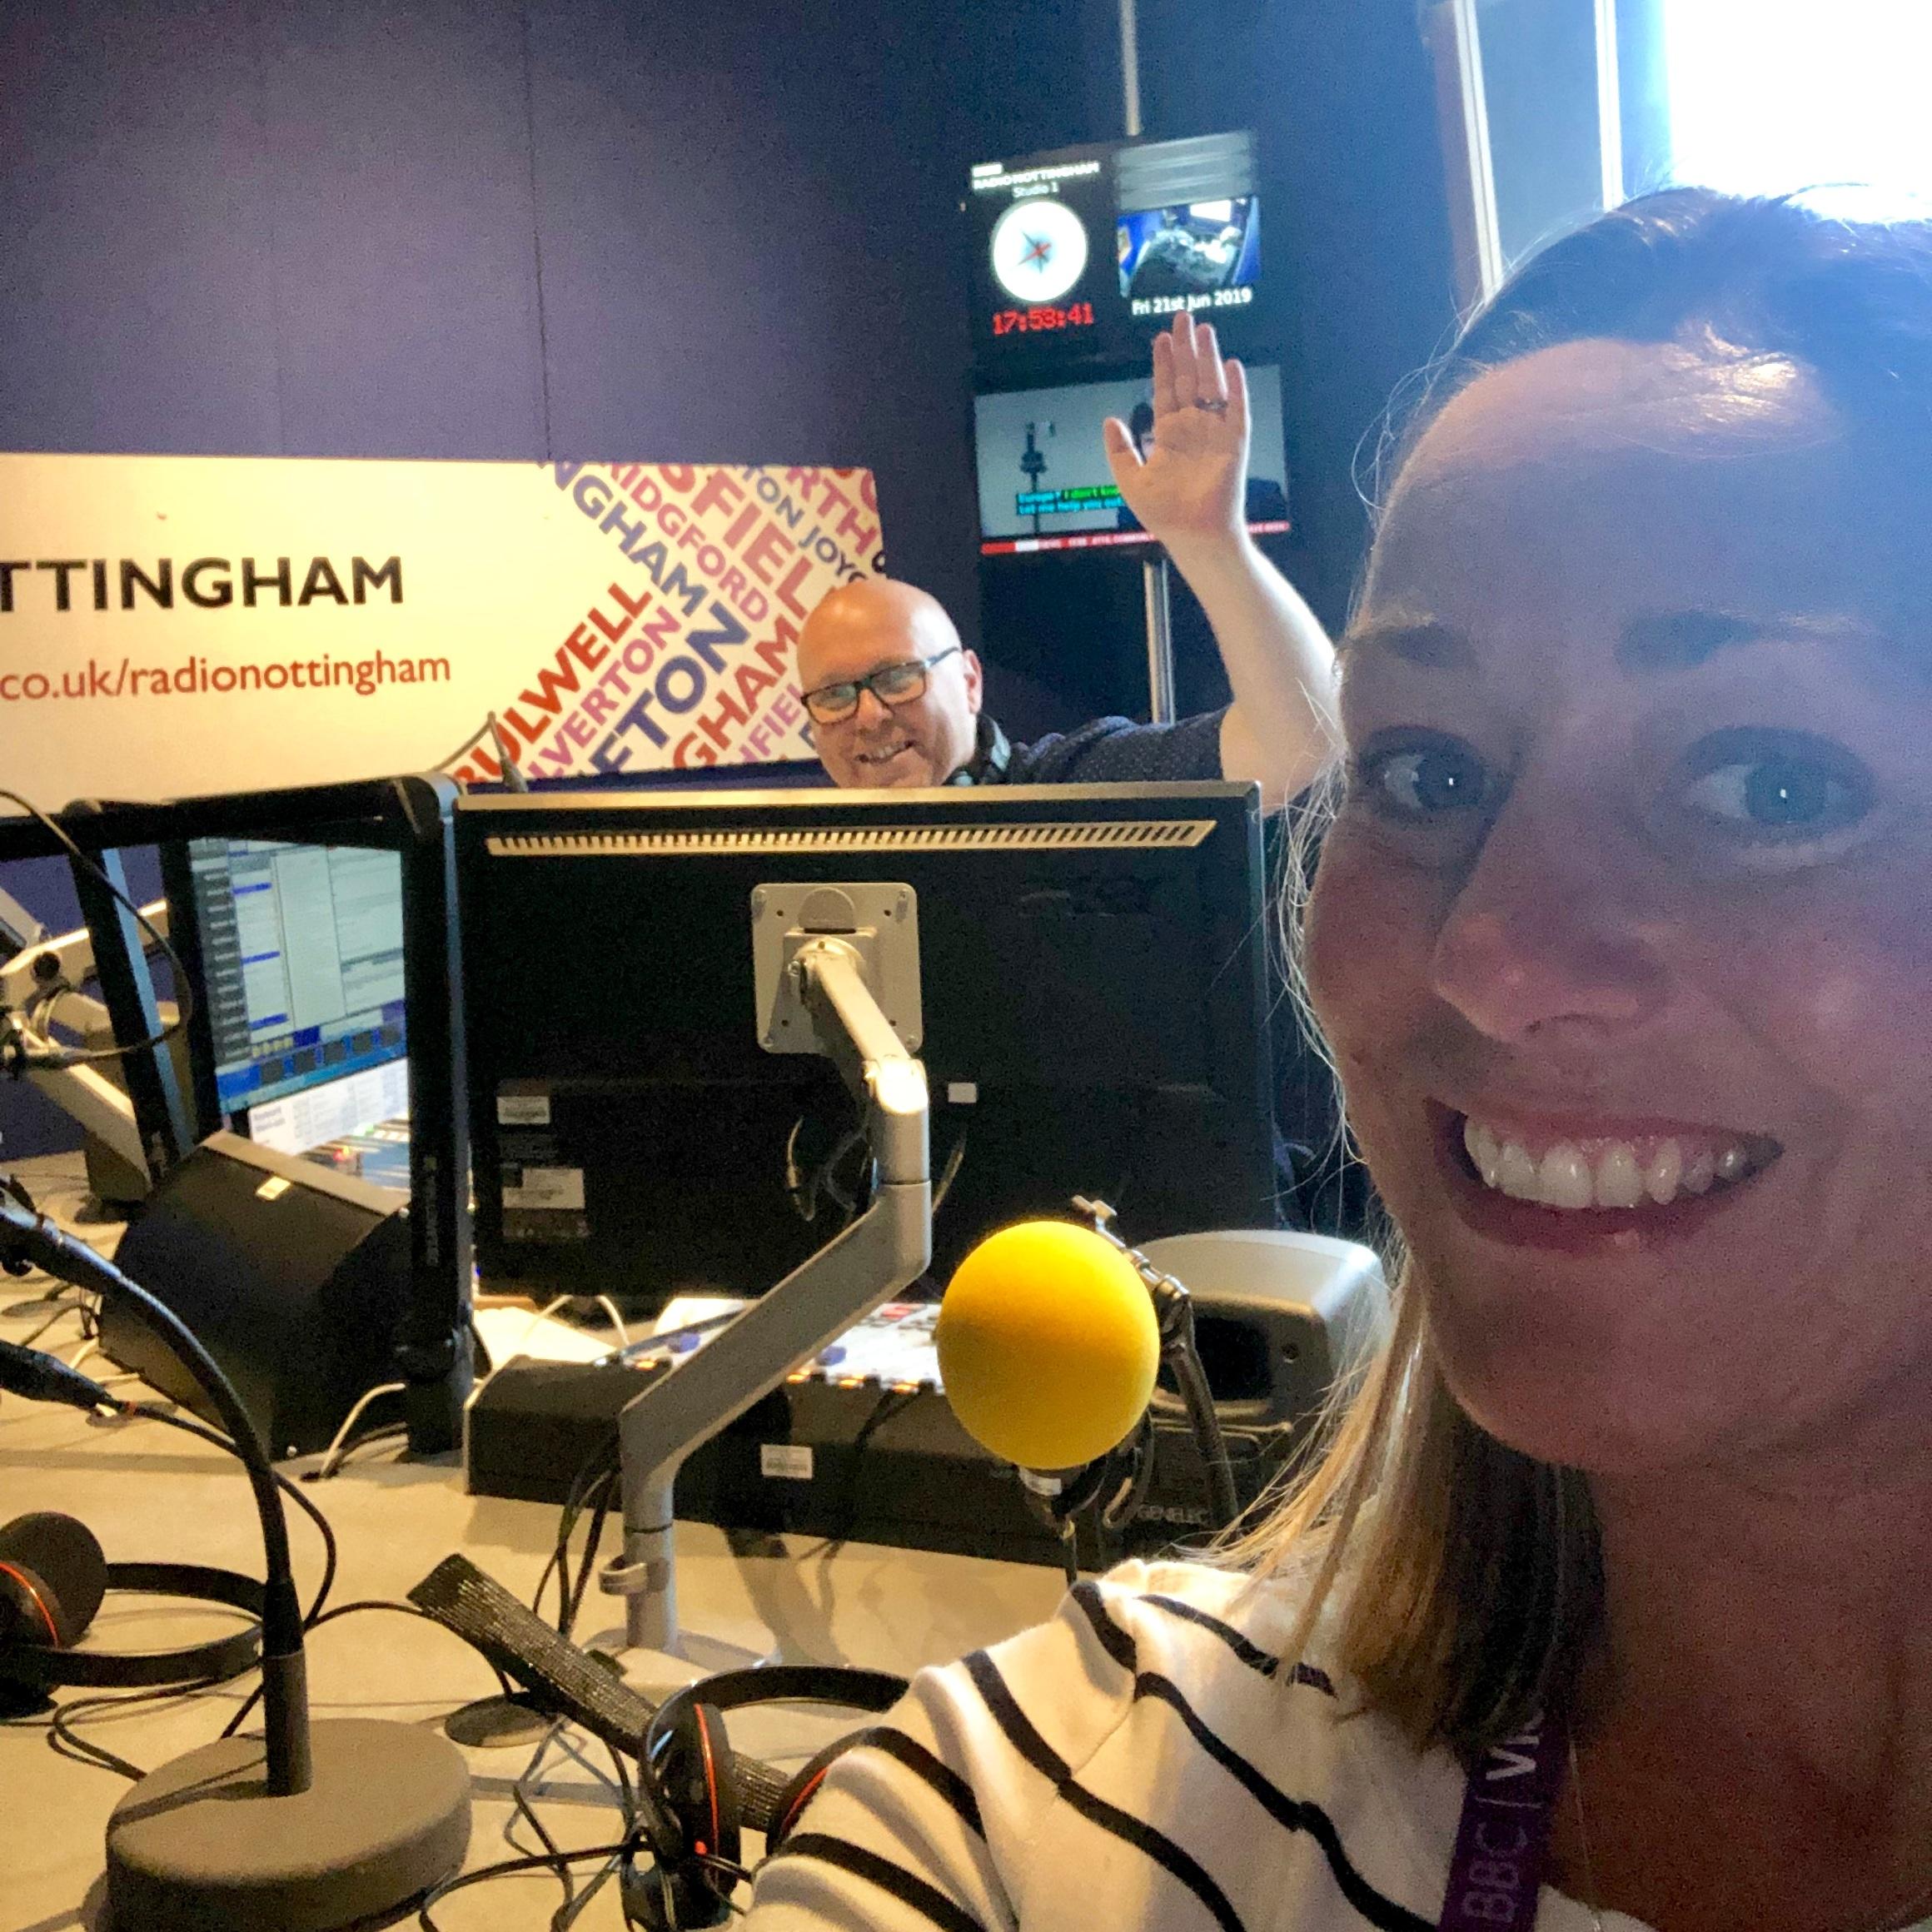 Lee-ann+from+All+You+Yoga+in+Hucknall+talking+yoga+with+BBC+Radio+Nottingham+on+International+Day+of+Yoga+2019